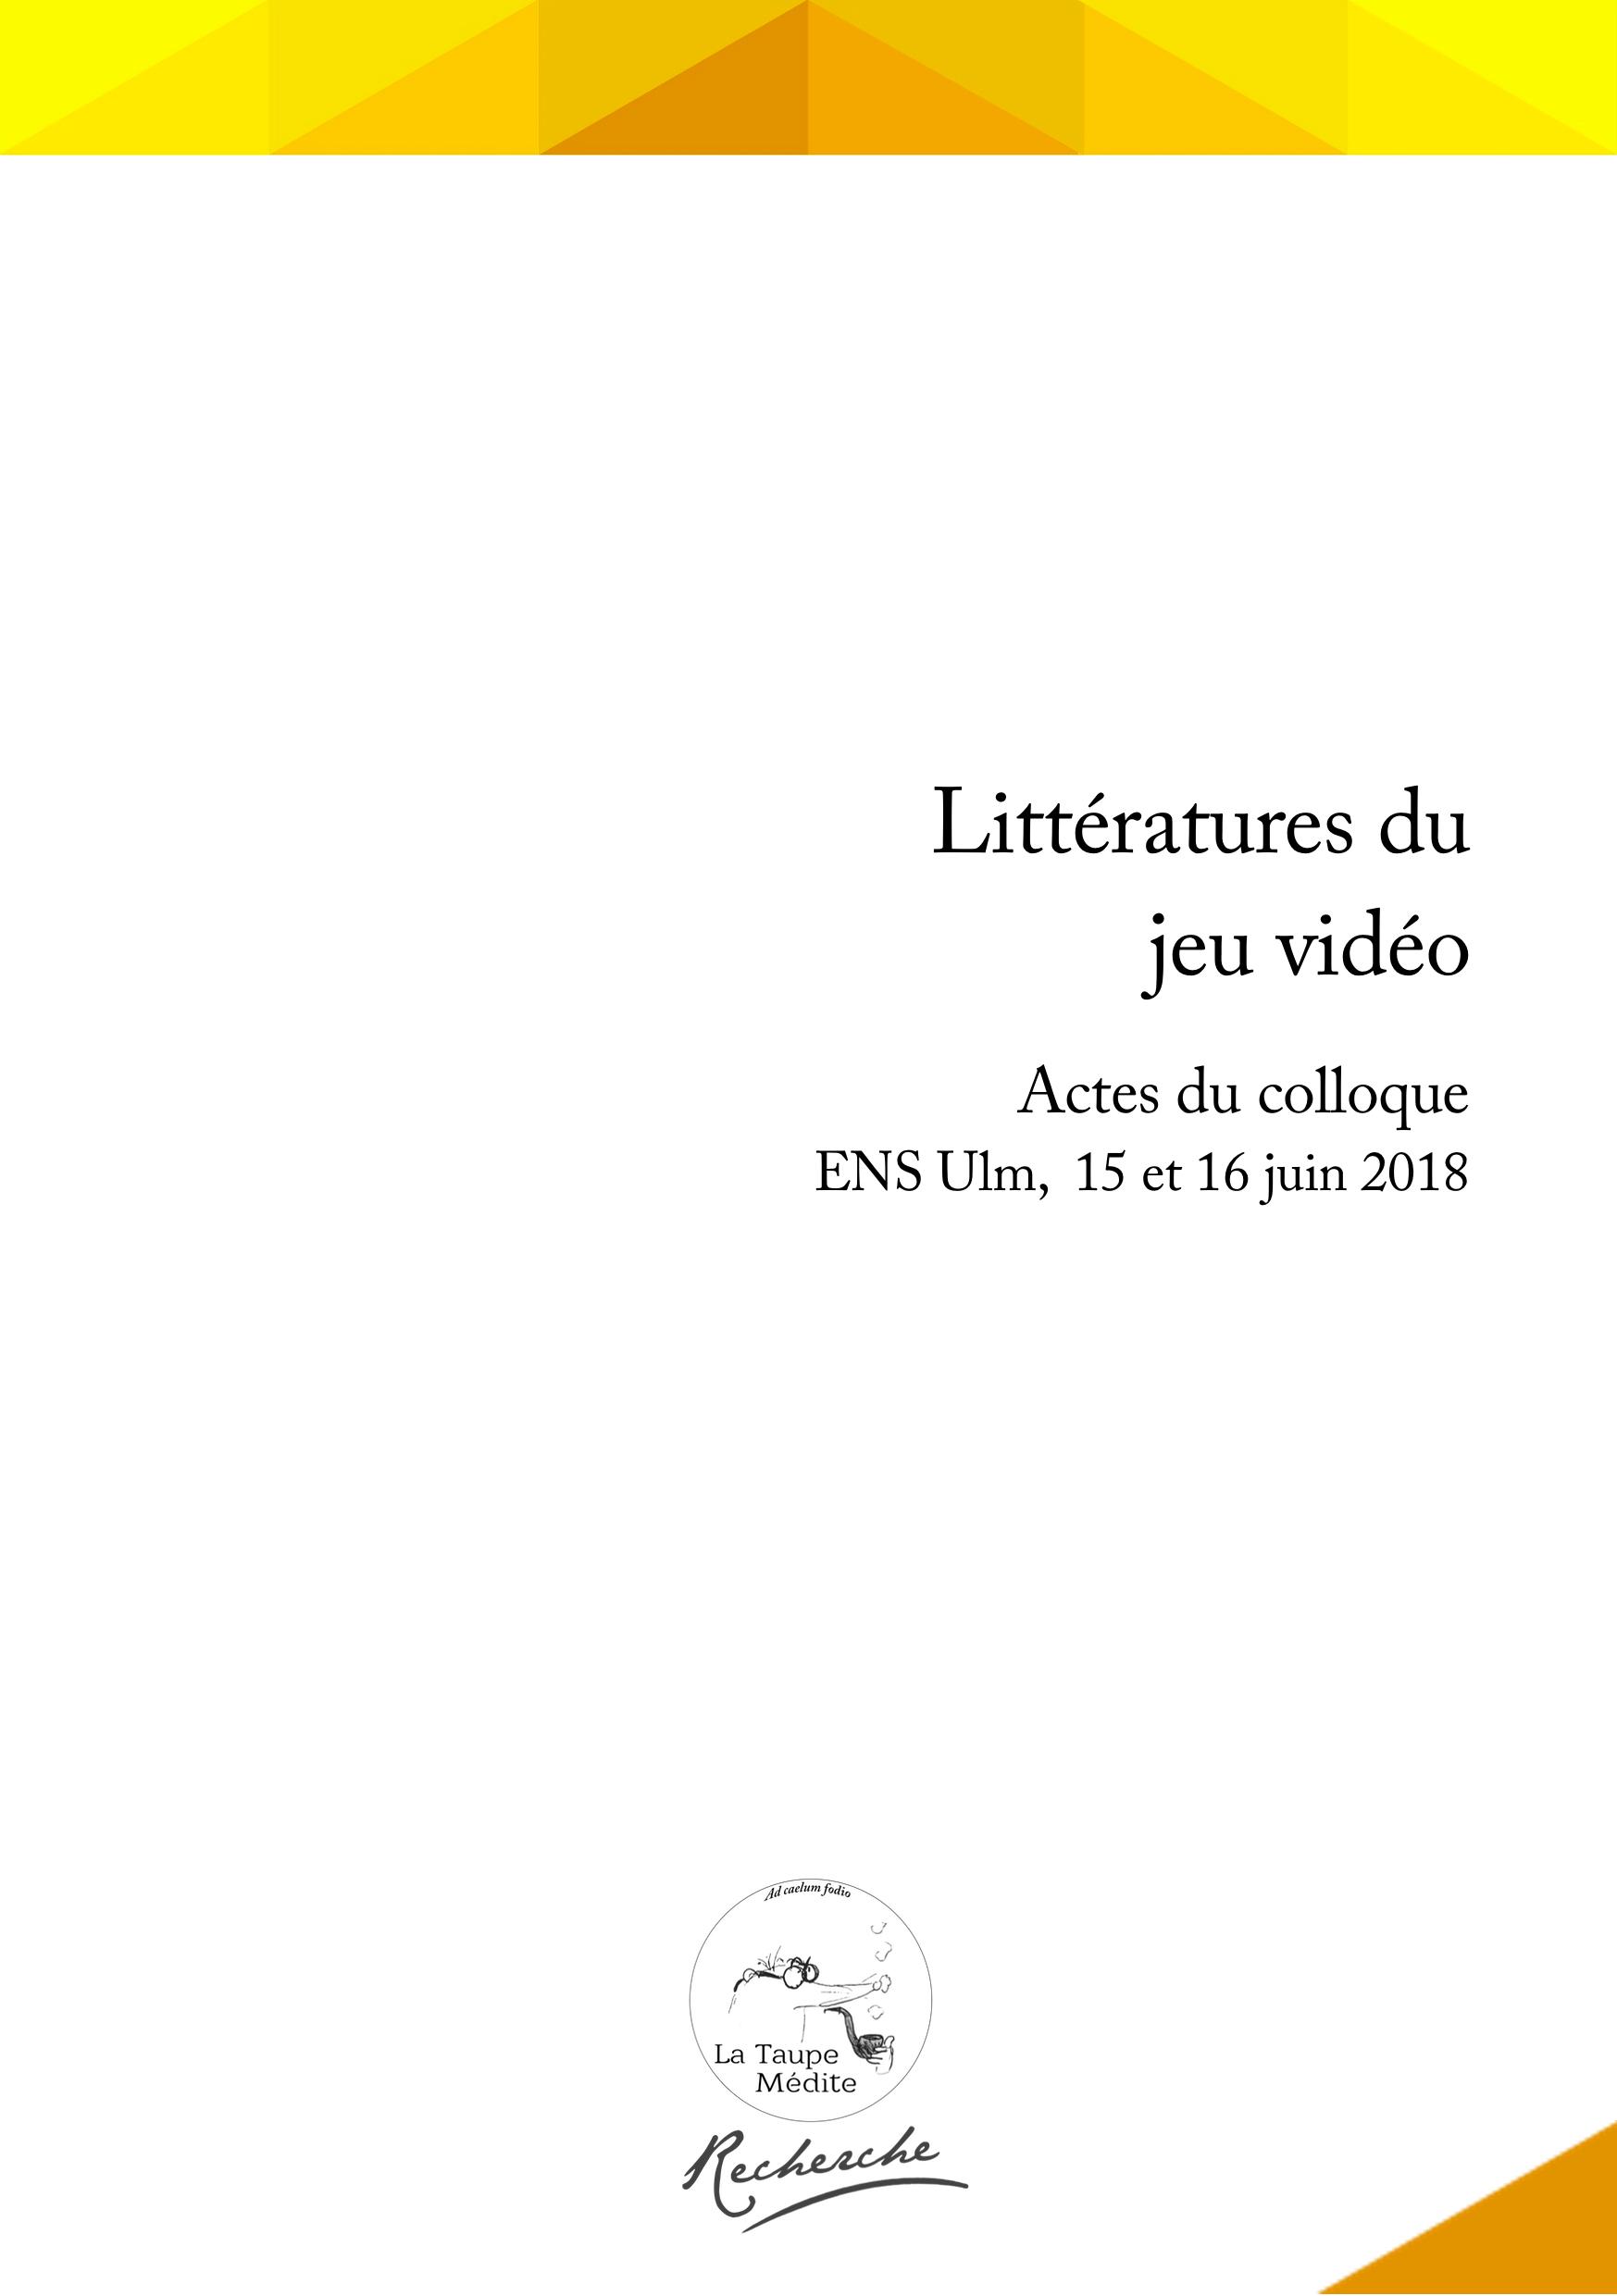 P.-A. Colombani, G. Grandjean, S. Würtz (Dir.), Littératures serapportantà Jeu De La Taupe